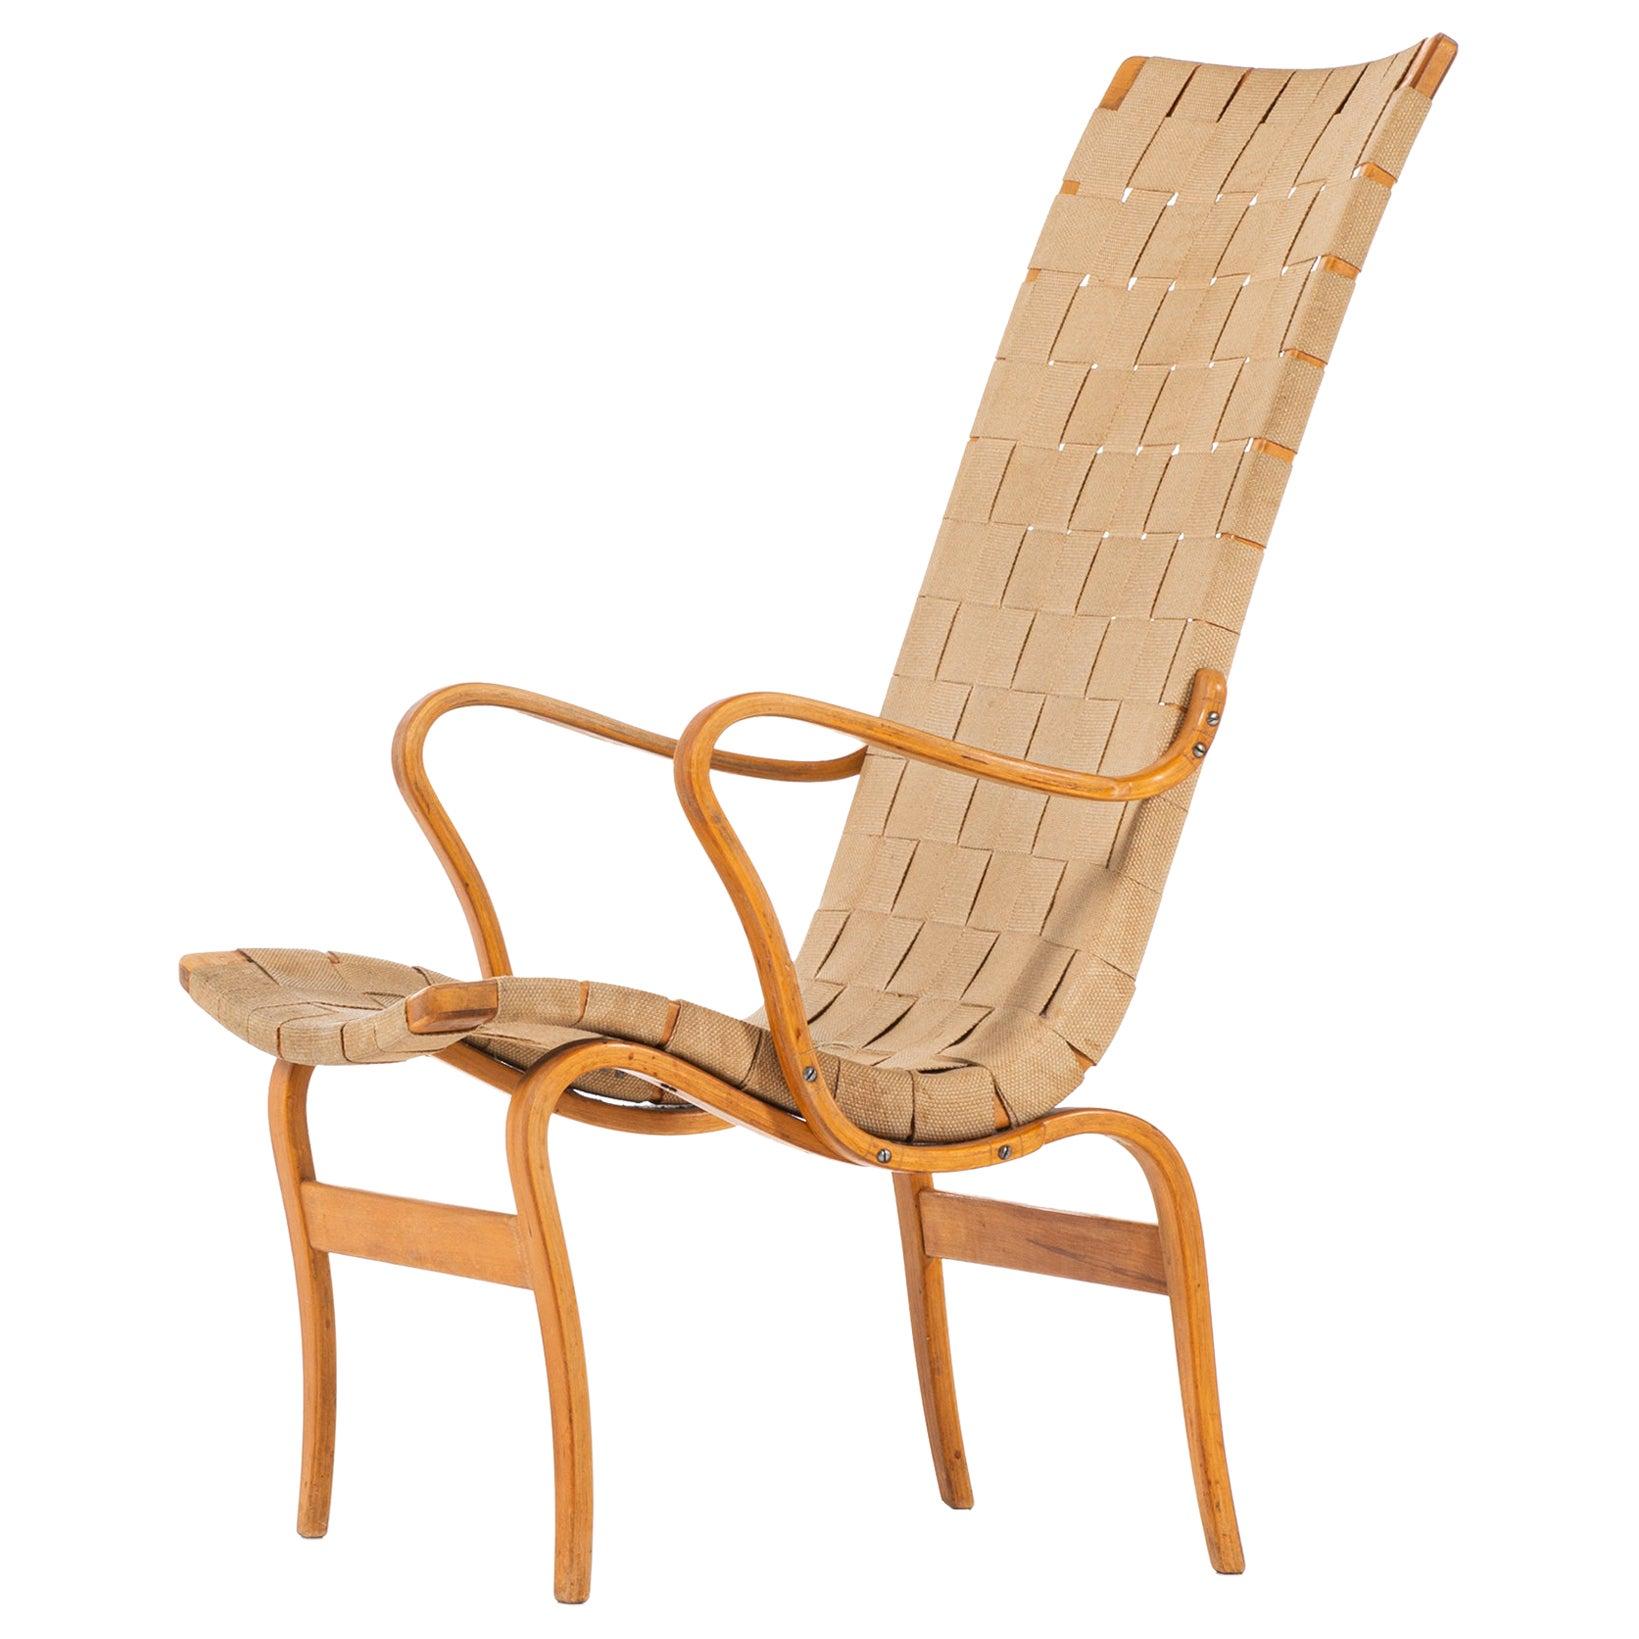 Bruno Mathsson Easy Chair Model Eva Hög Produced by Karl Mathsson in Sweden